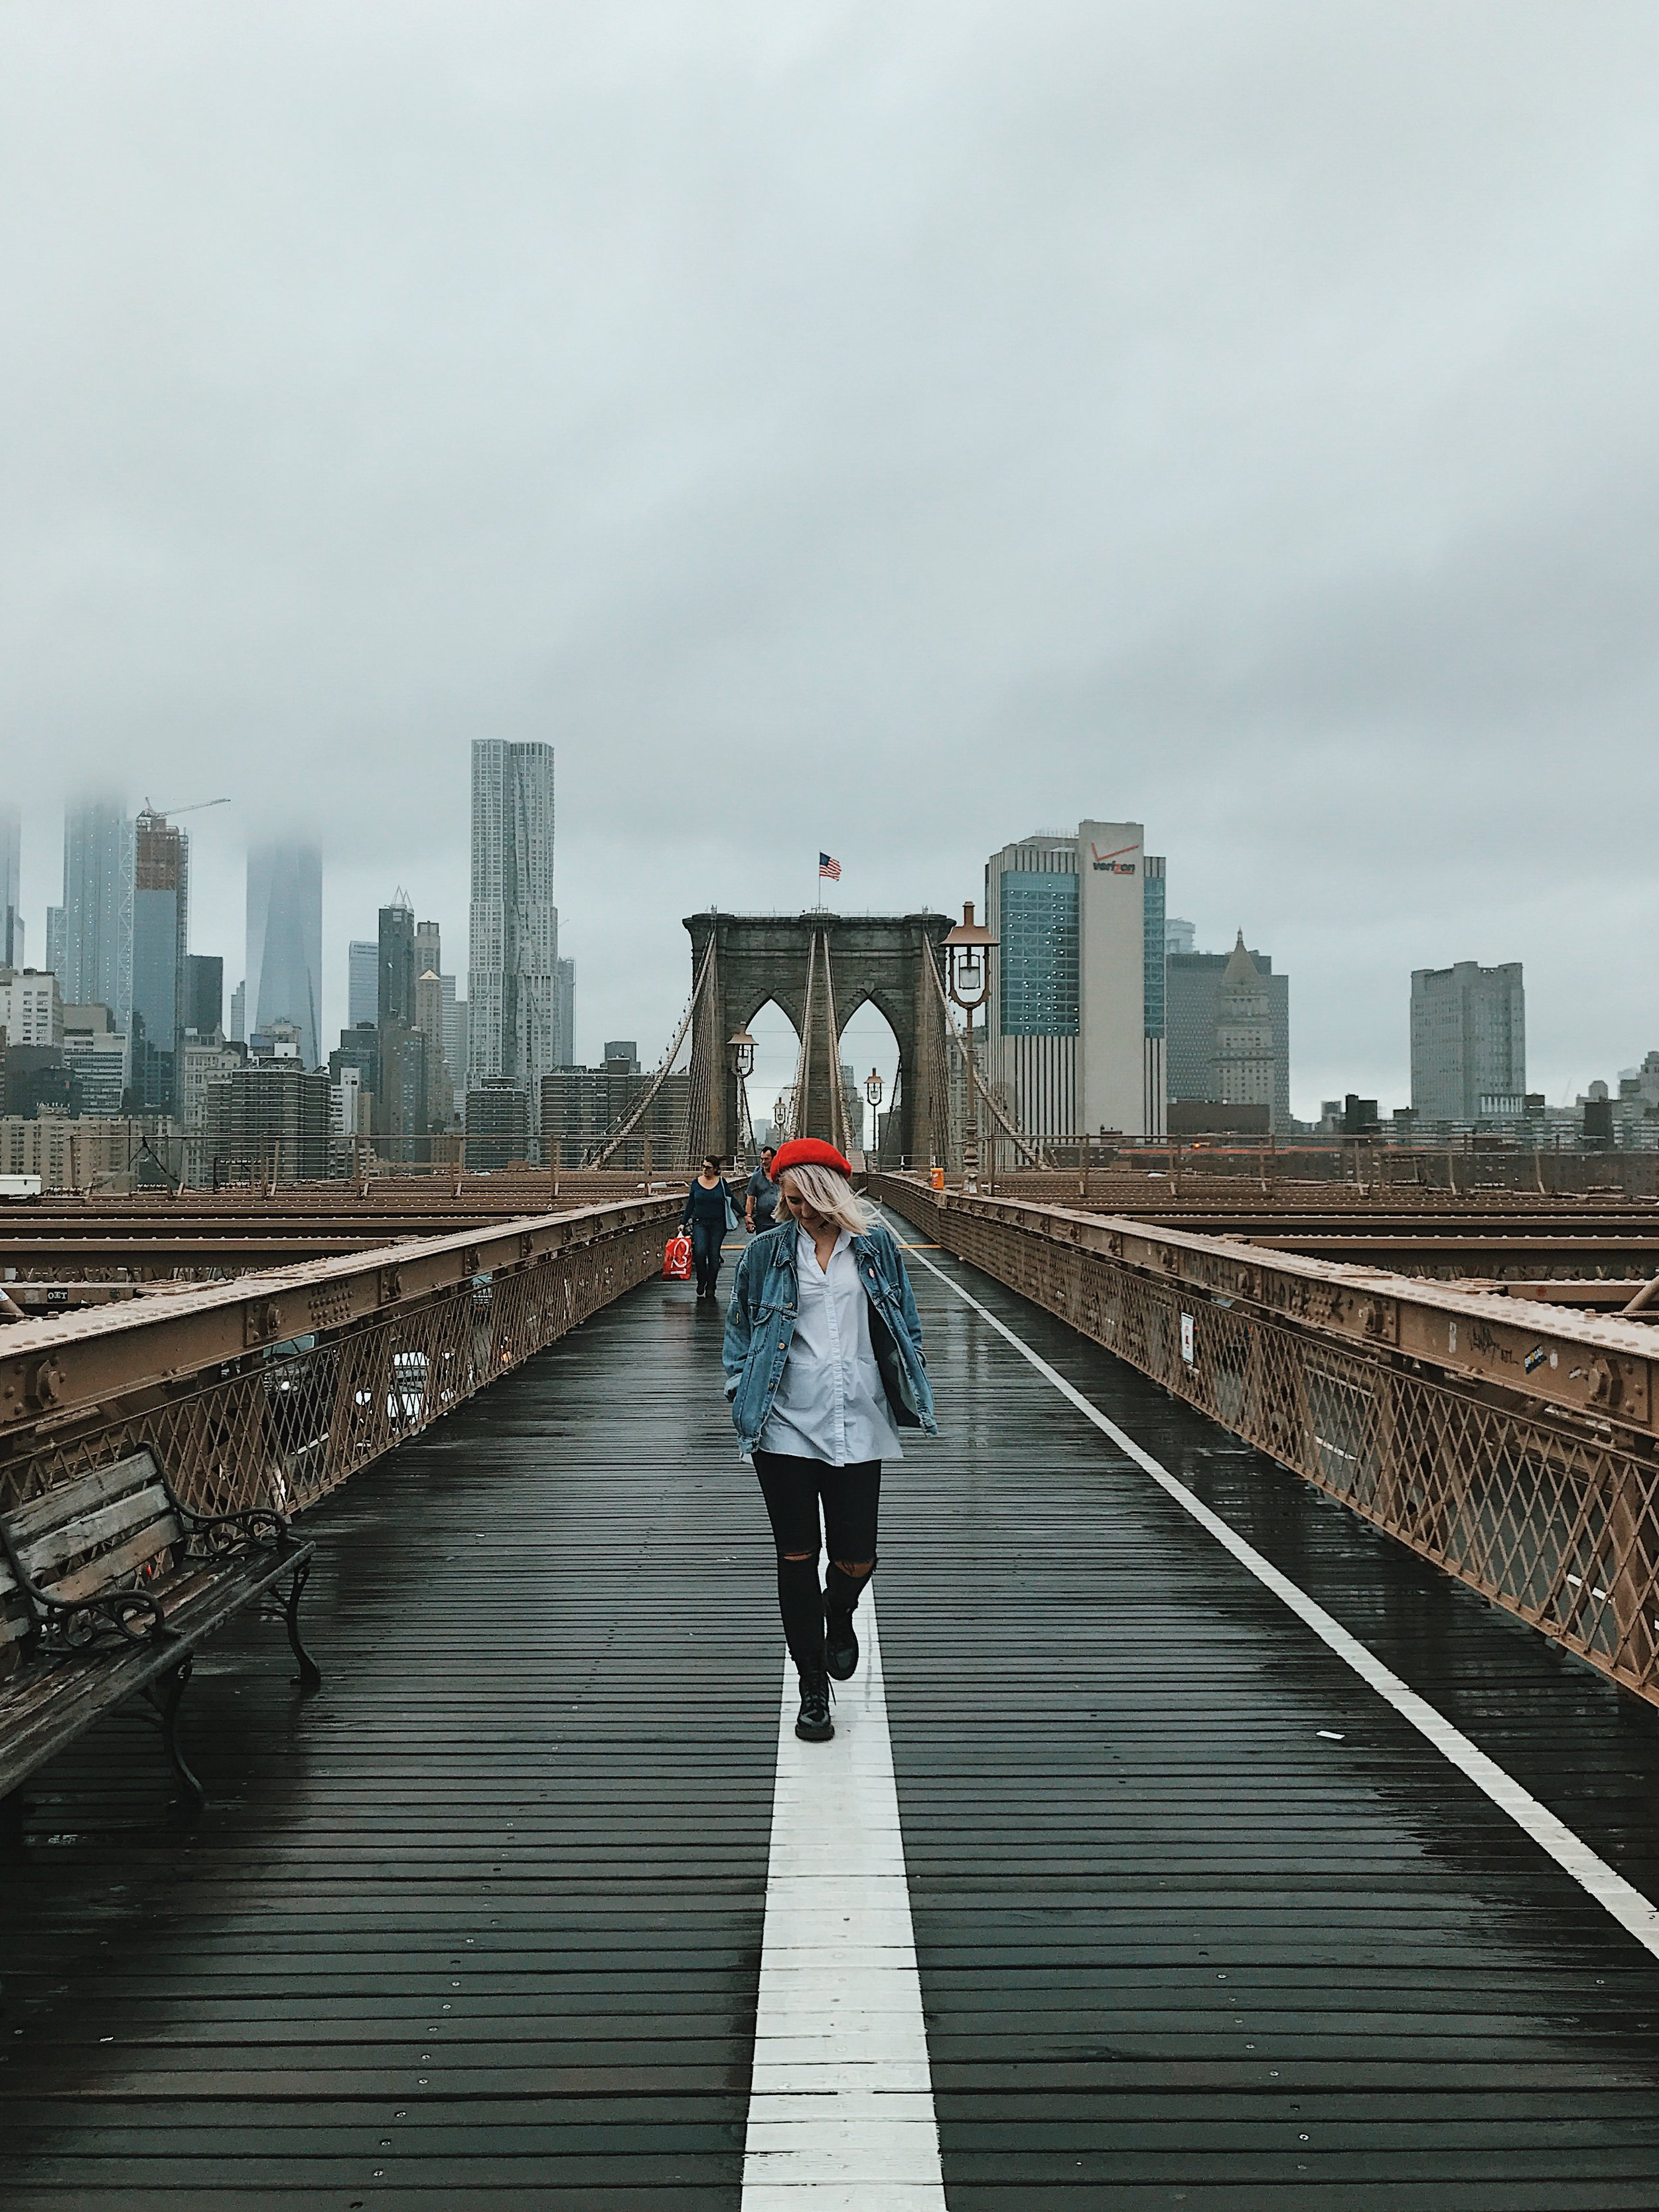 New York - Brooklyn Bridge - Jess Withey Travels - Travel Blog